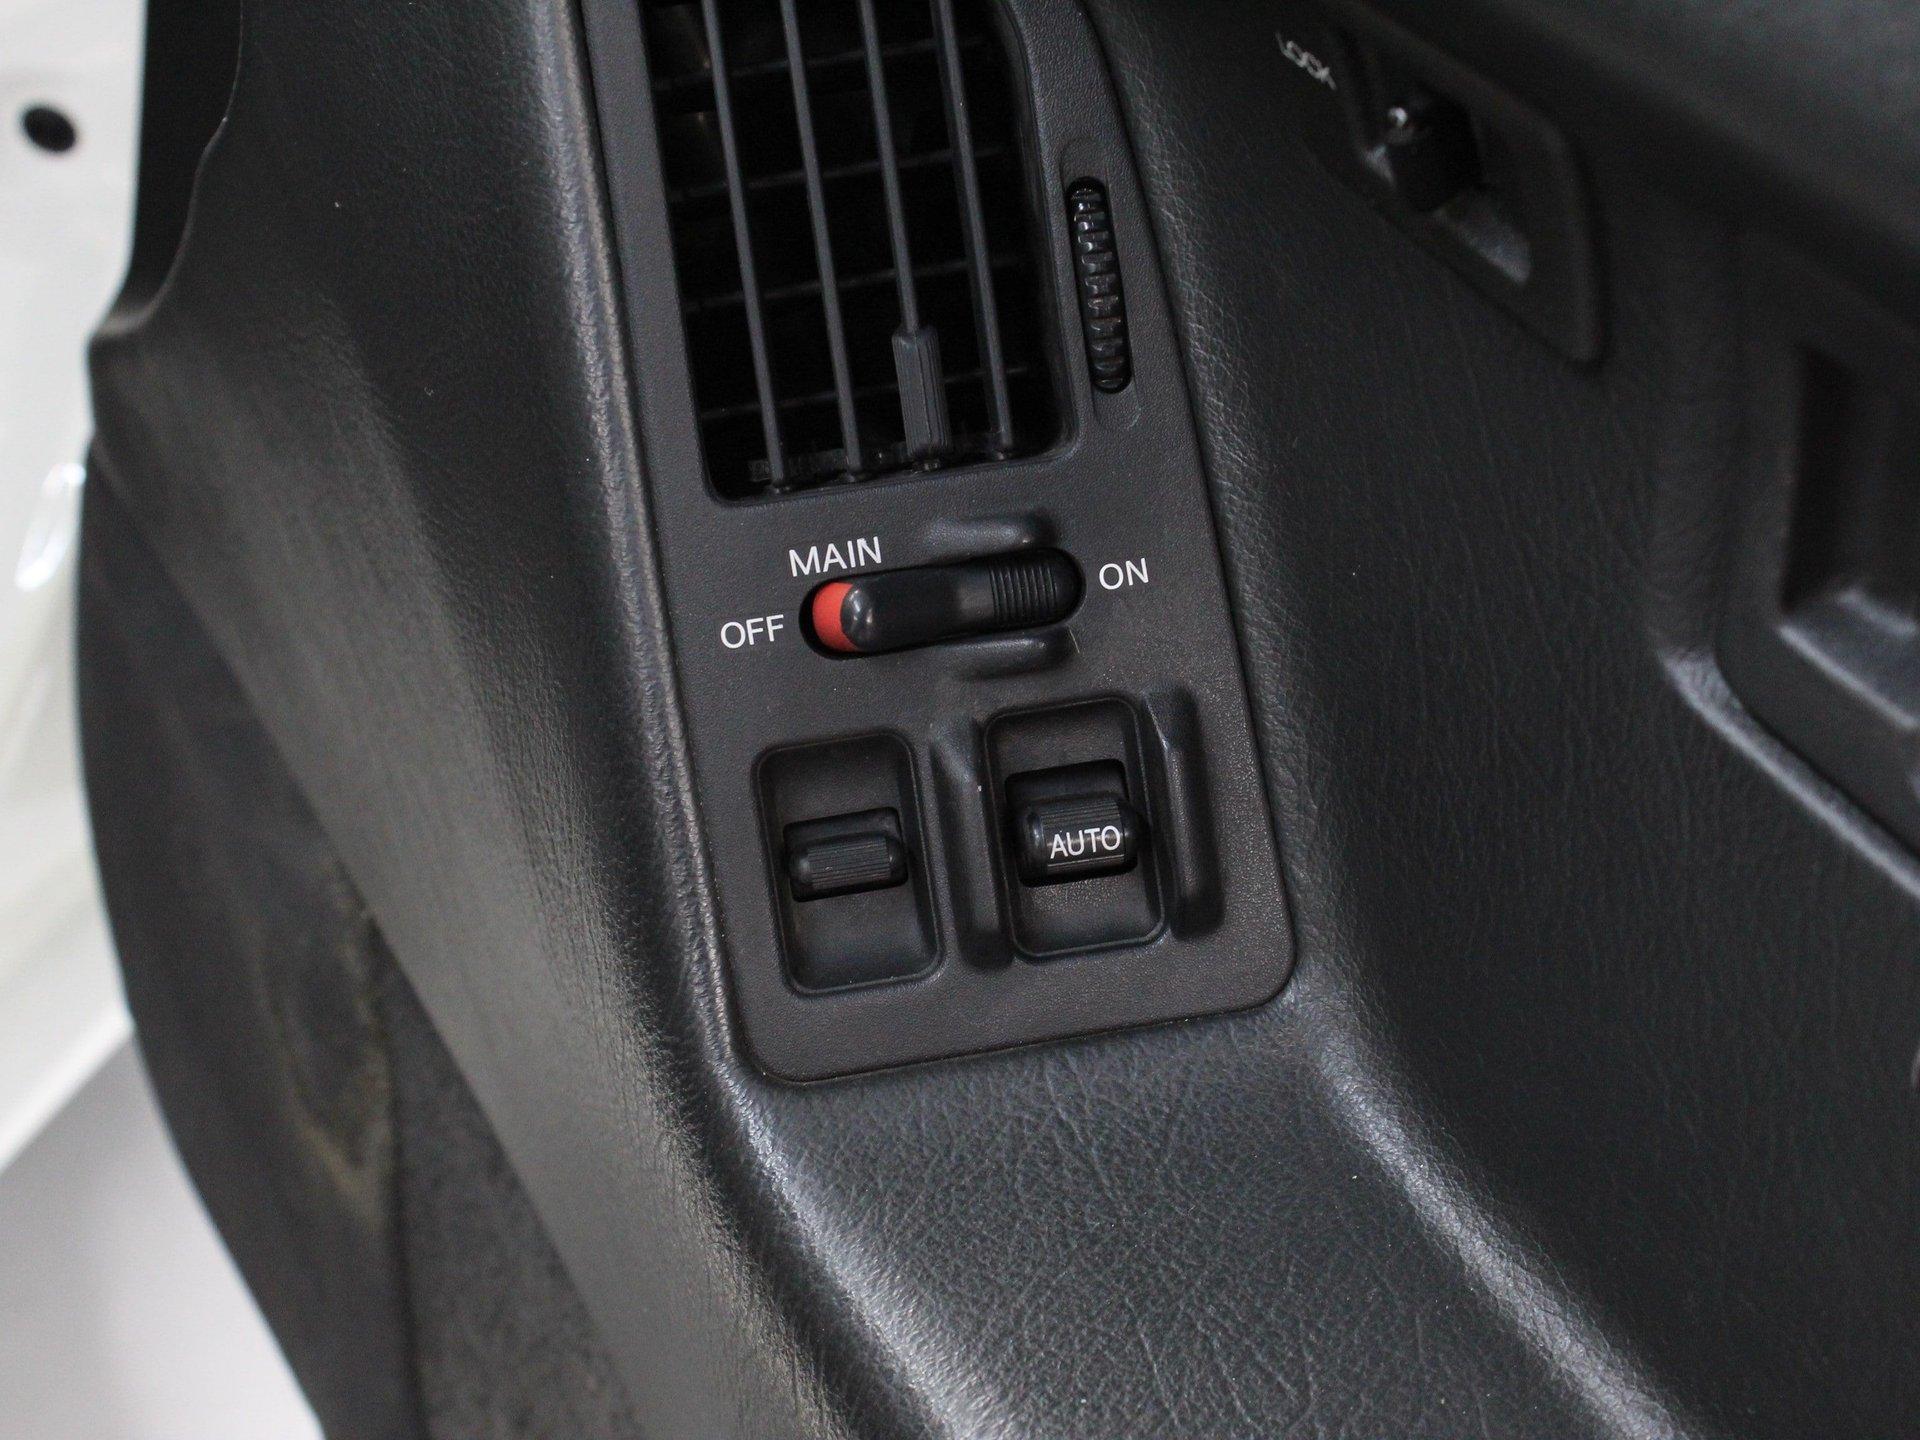 1989 Honda Prelude